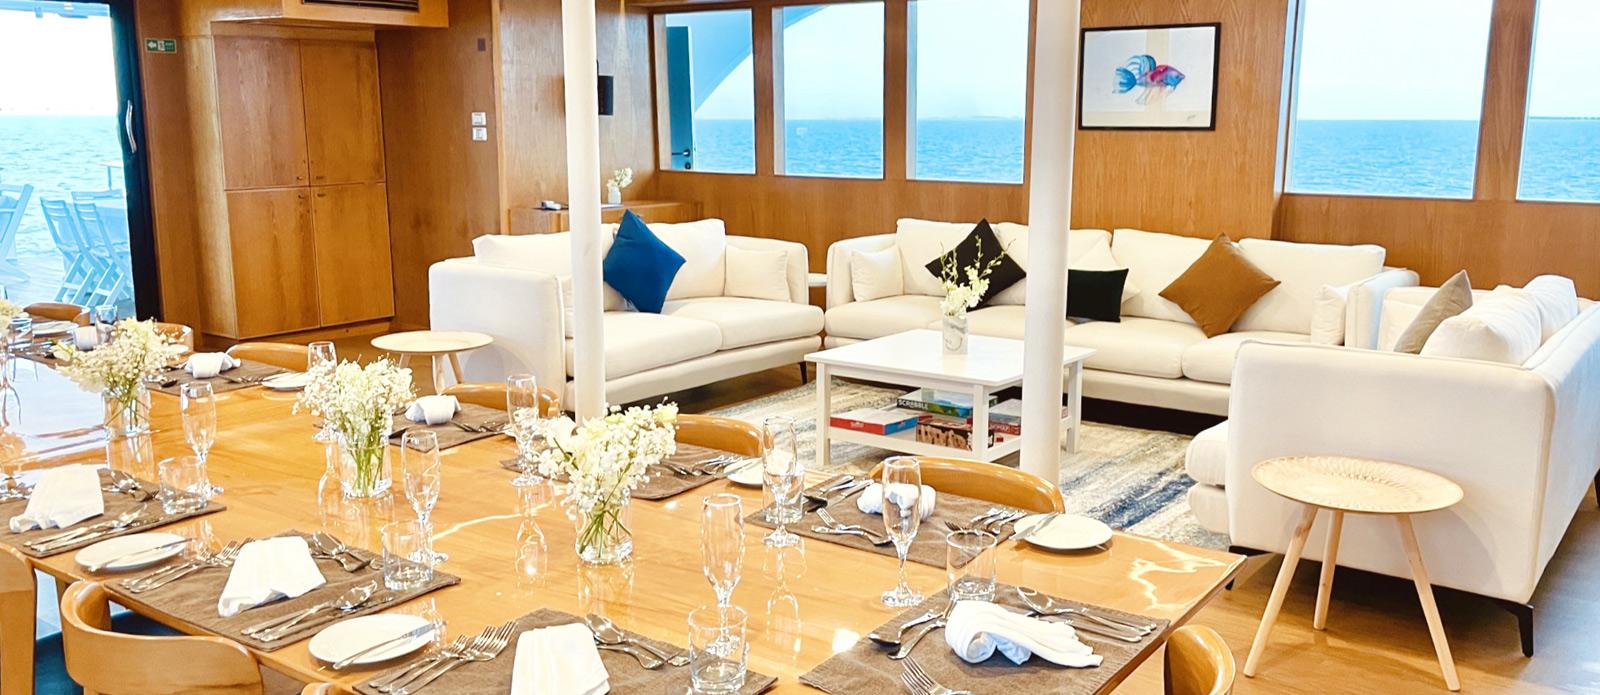 Safira-Luxury-Yacht-For-Sale-Interior-3